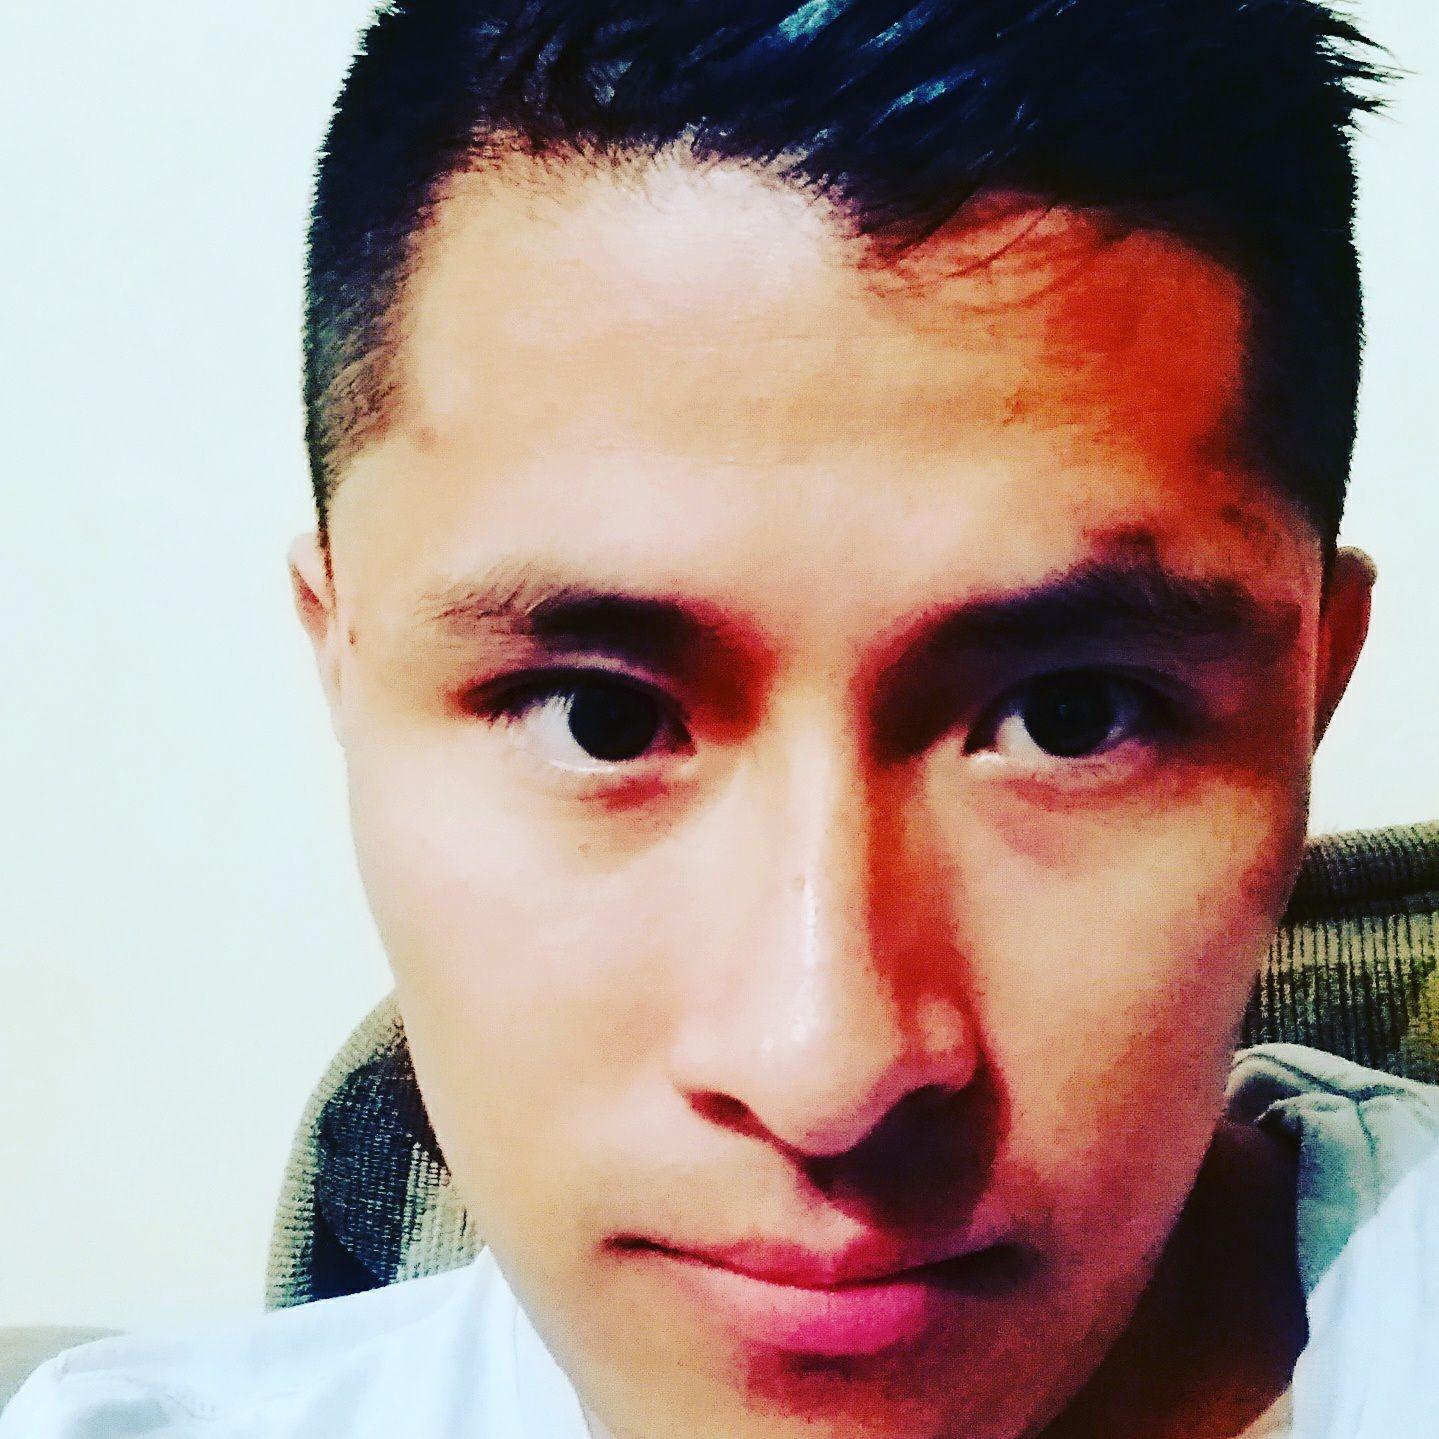 Perfil de Daniel Herrera